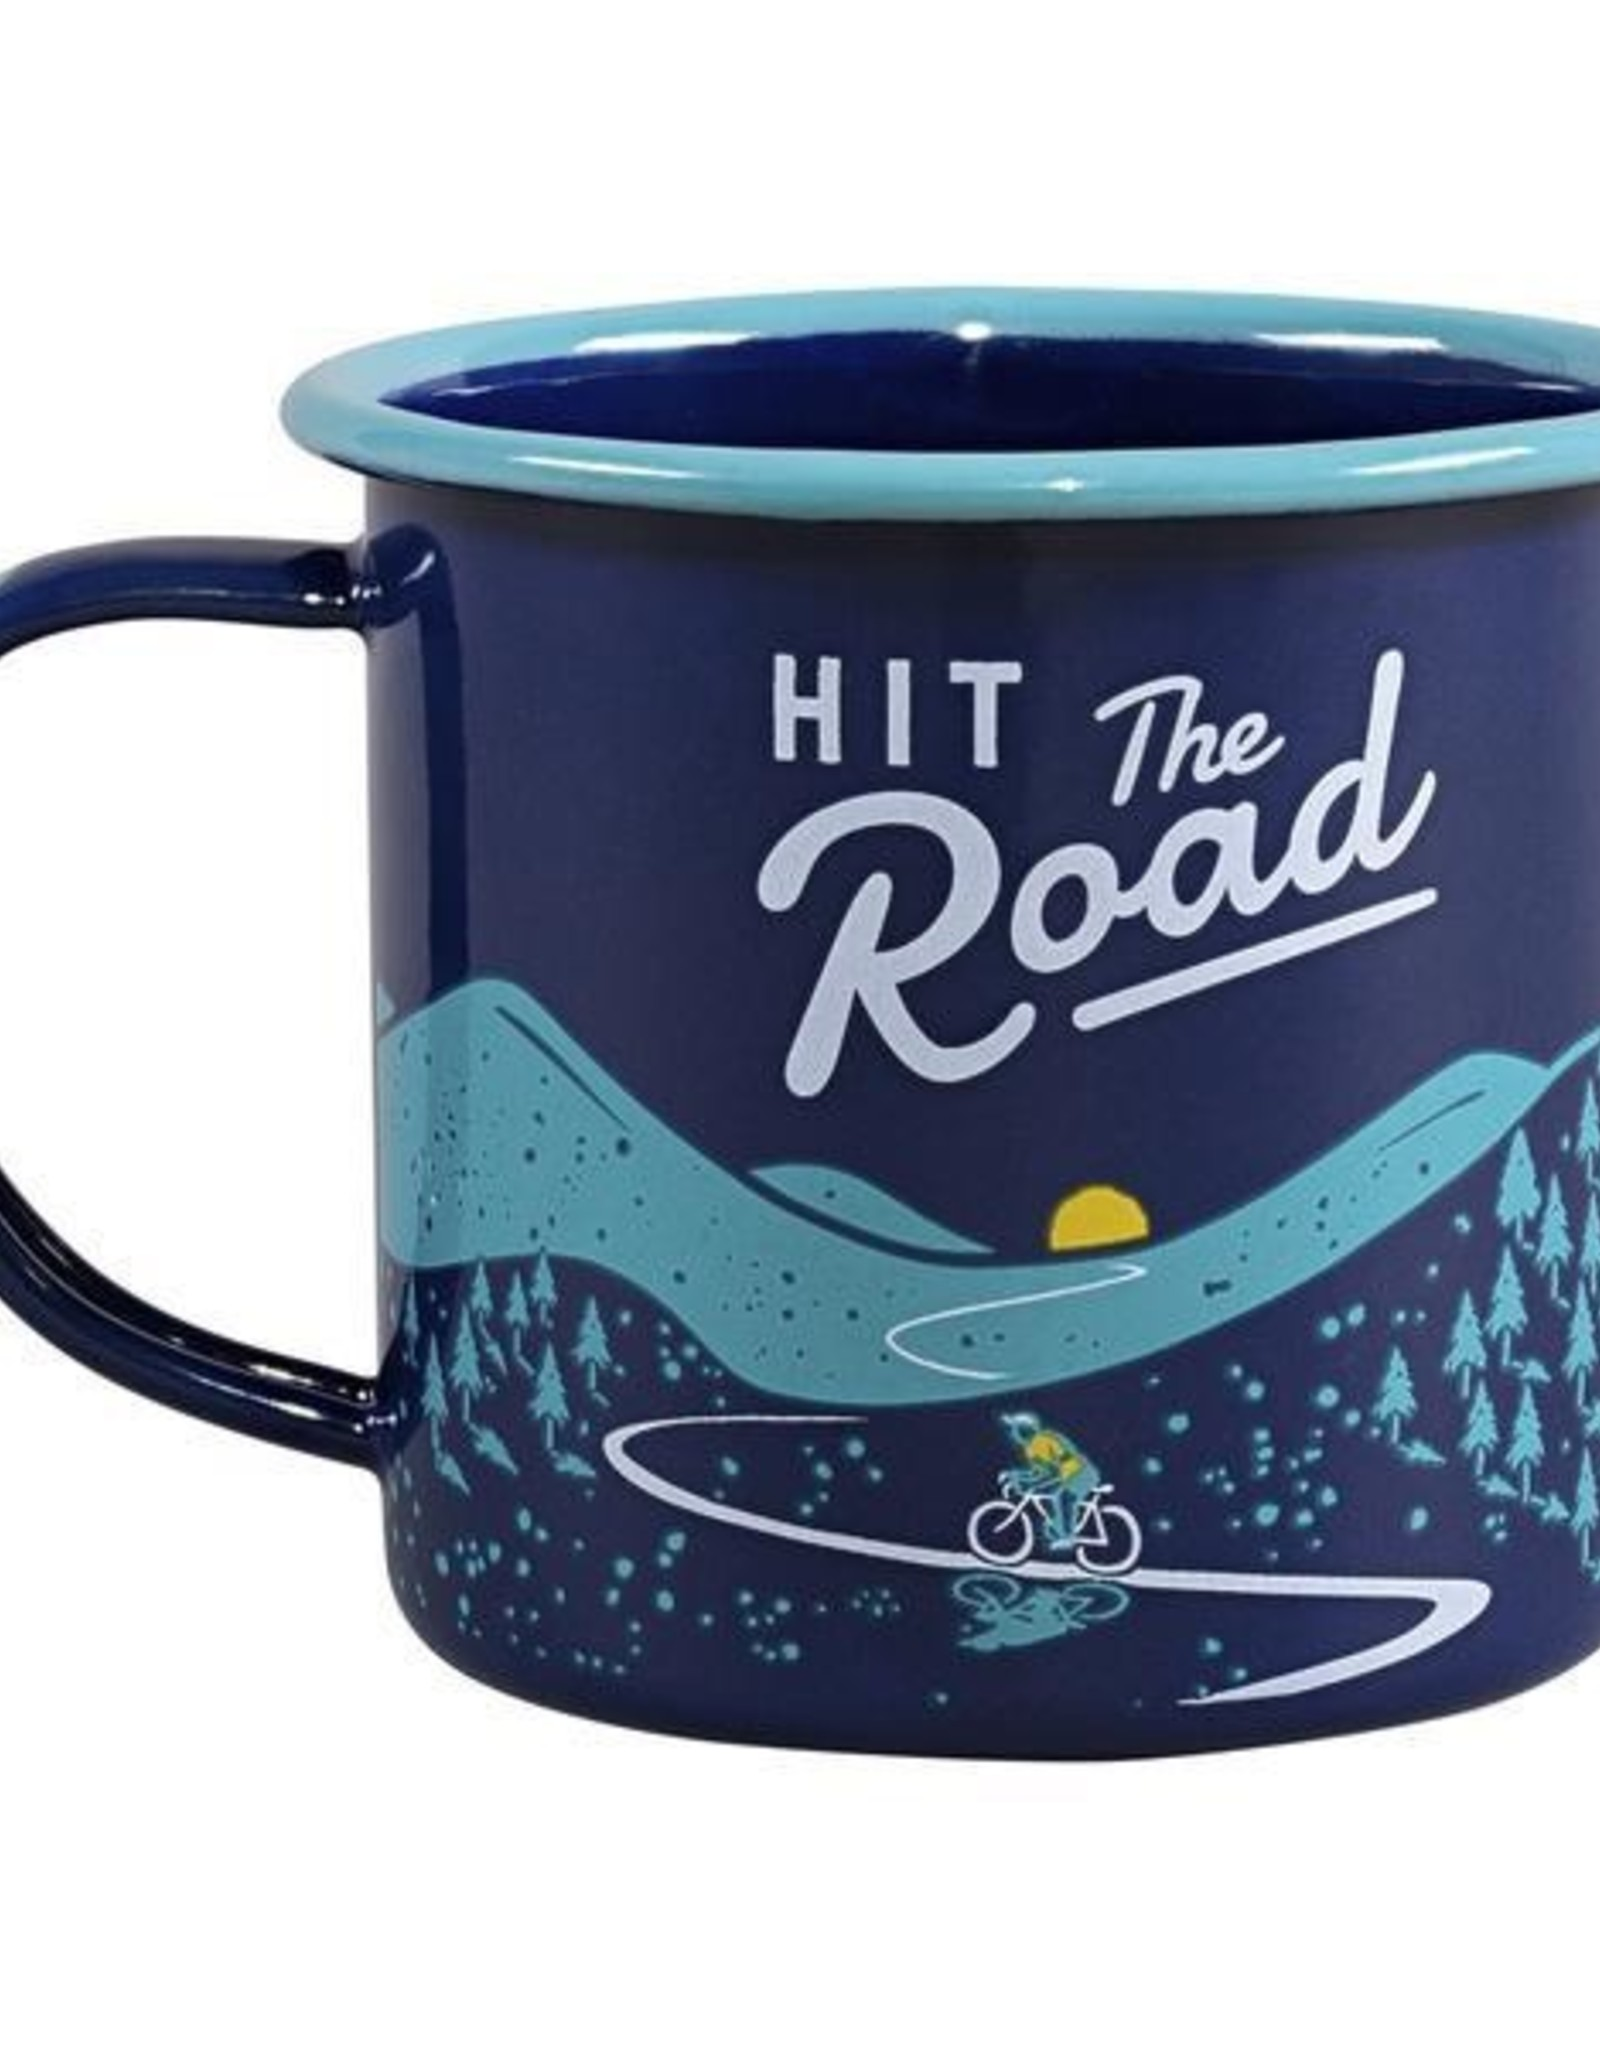 Hit The Road Enamel Mug